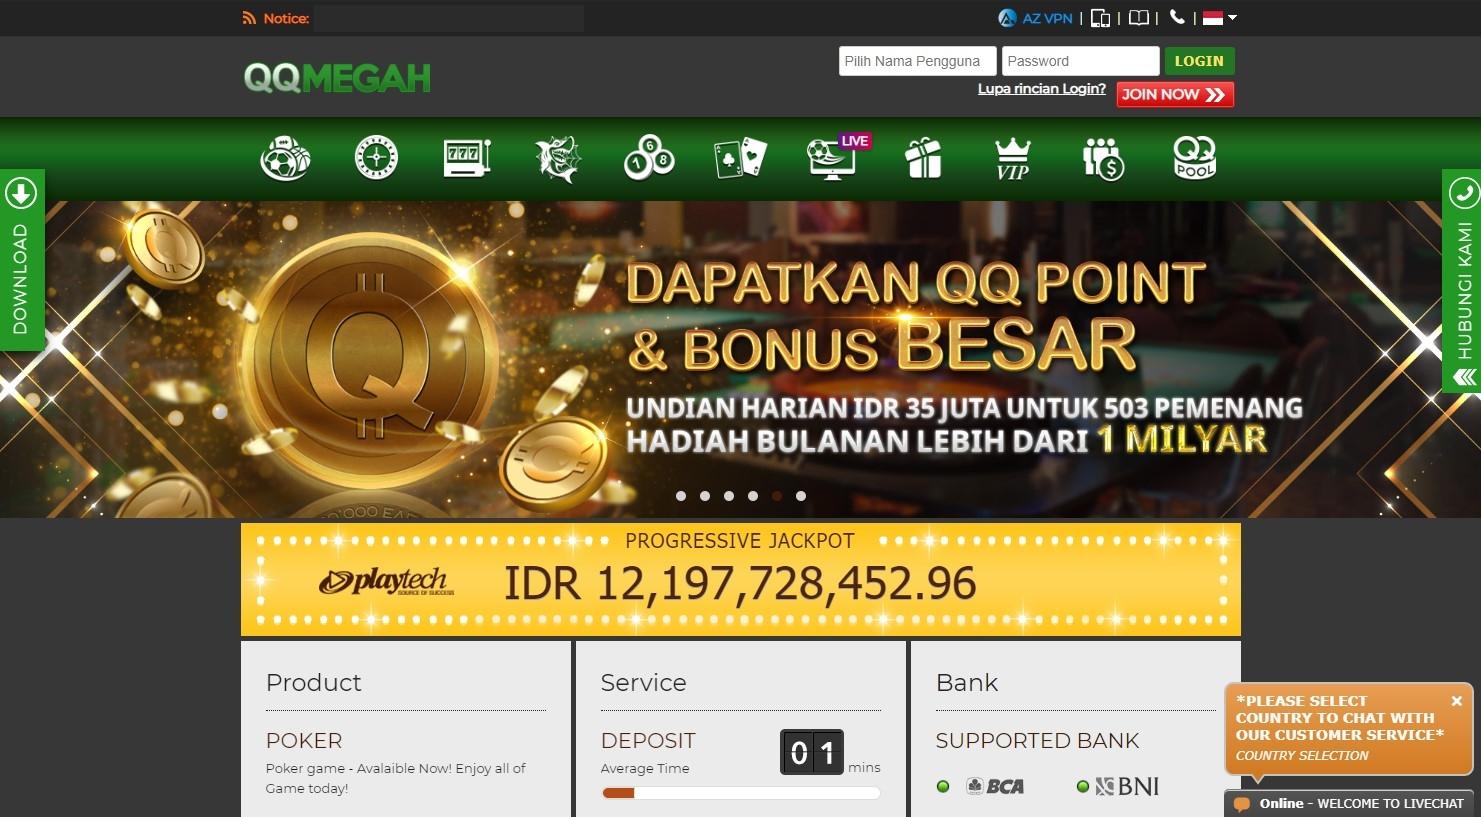 QQMEGAH Situs Judi Slot Bandar Casino Online Terpe (@situsslotonlineqqmegah) Cover Image